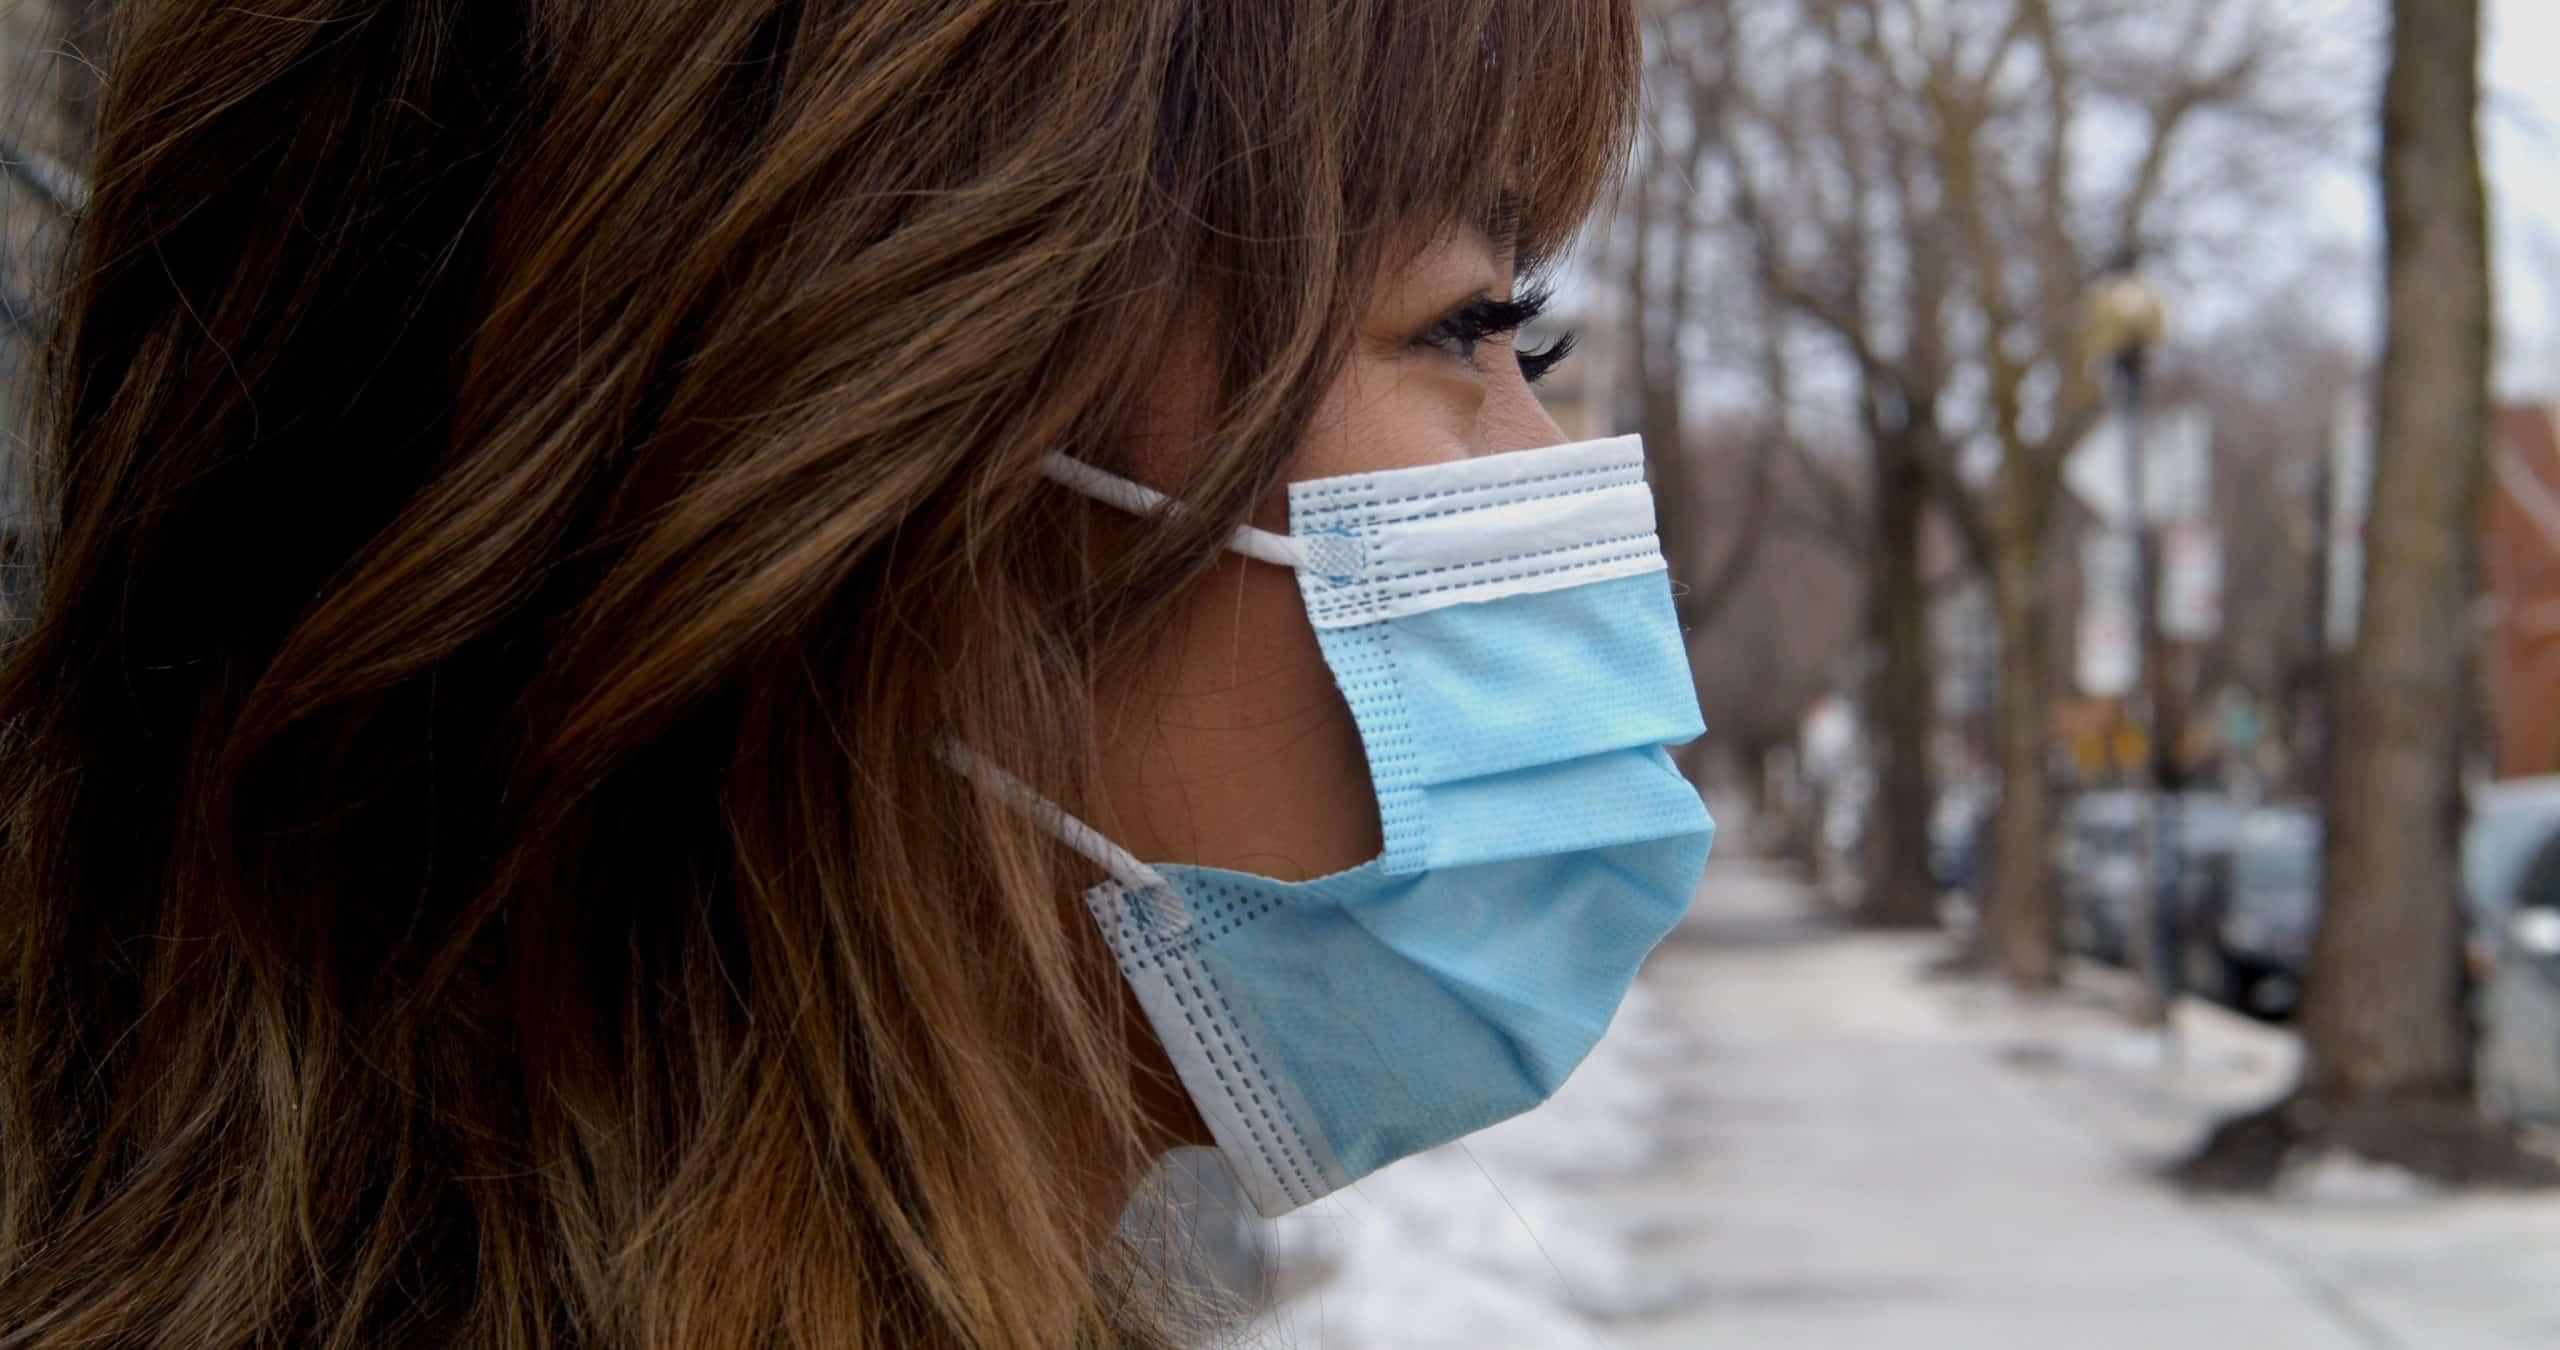 Canadian Made Medical Face Masks | ASTM Level 1, 2 and 3 medical face masks, medical face masks made in canada, Calgary company makes medical grade face masks from canadian materials, Medical Mask and non-medical mask, 3ply face mask, 3 layered face mask